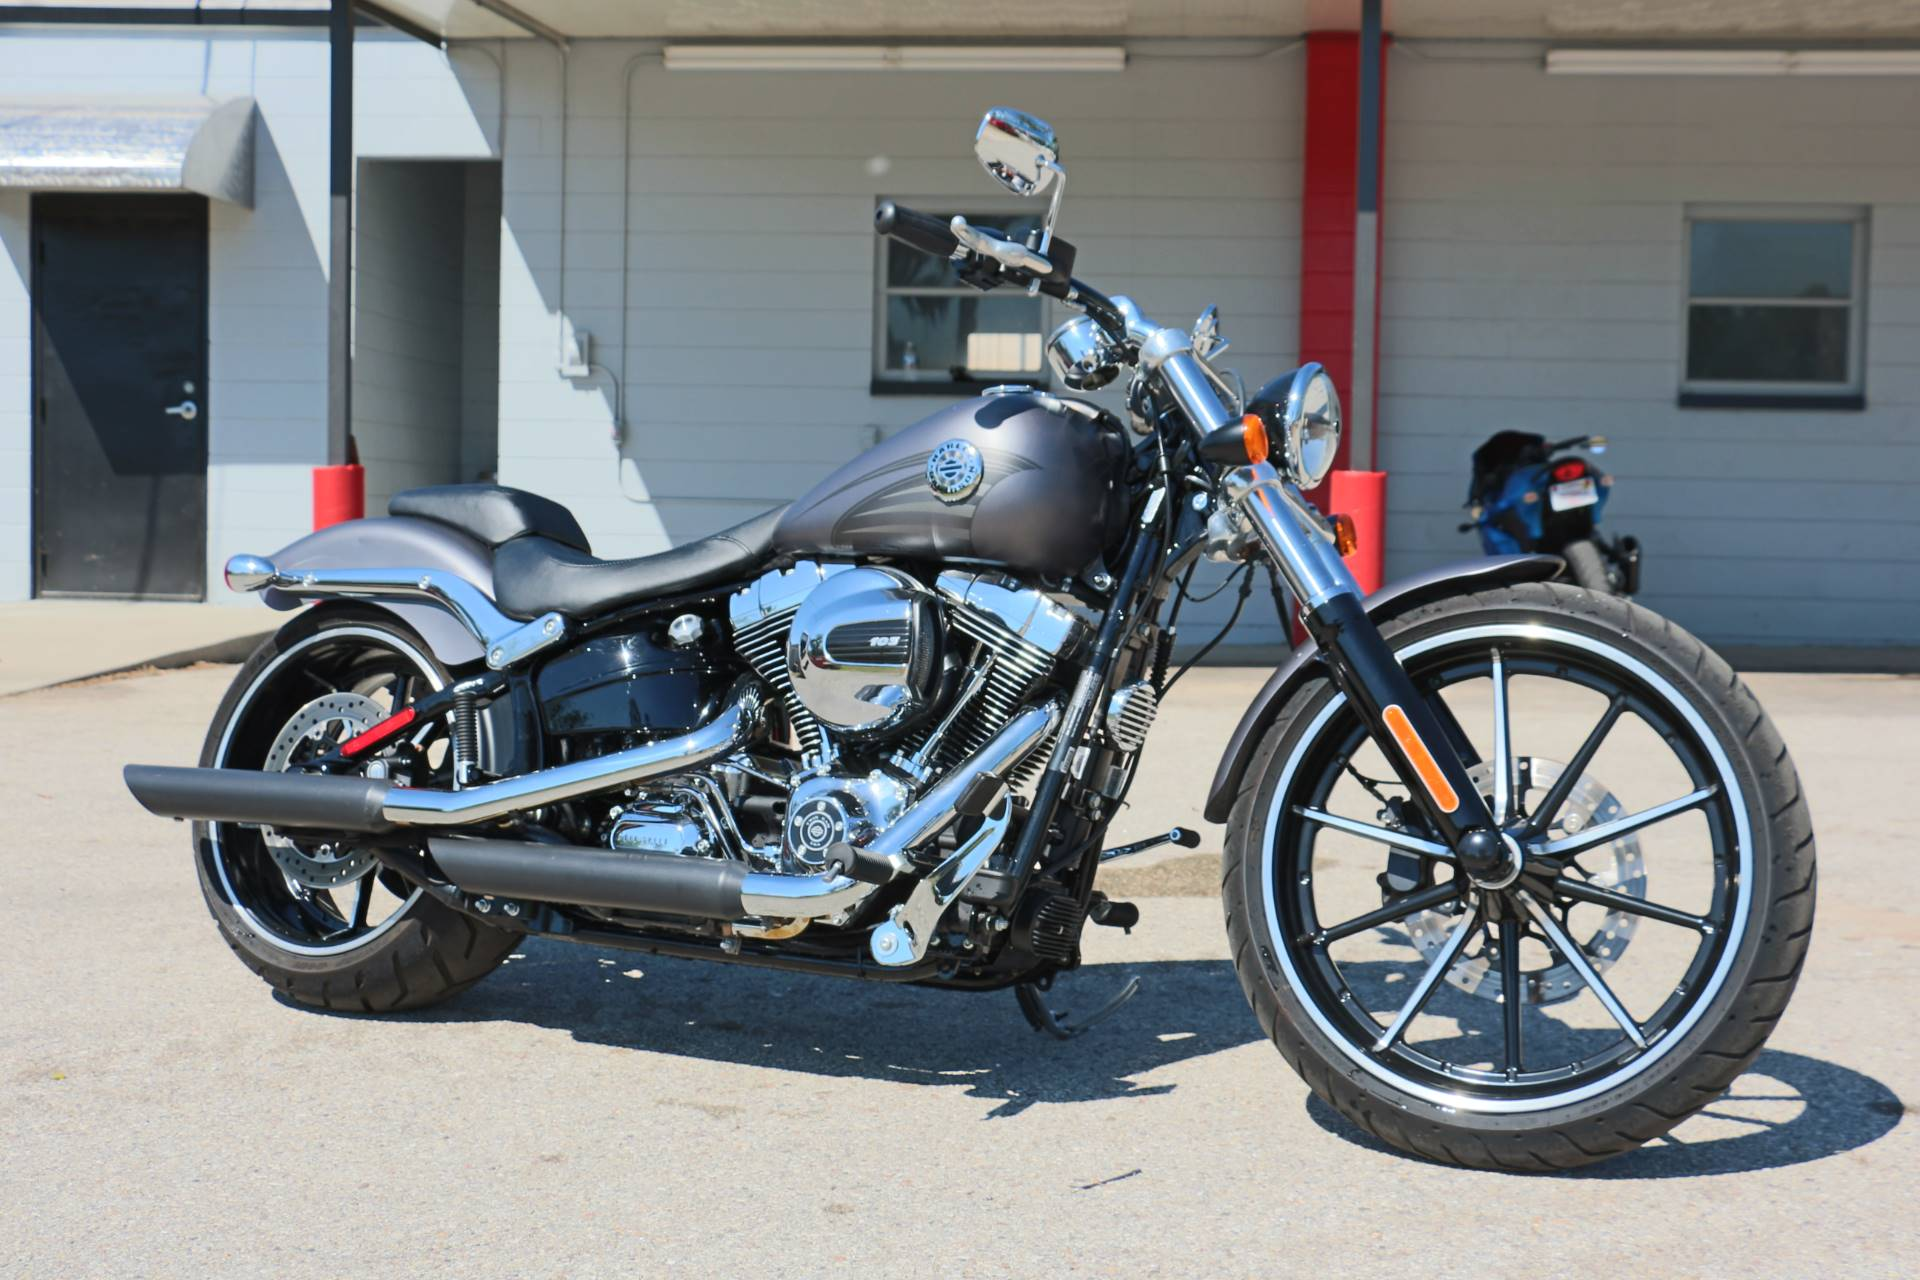 Used 2016 Harley-Davidson Breakout® Motorcycles in Lakeland, FL ...